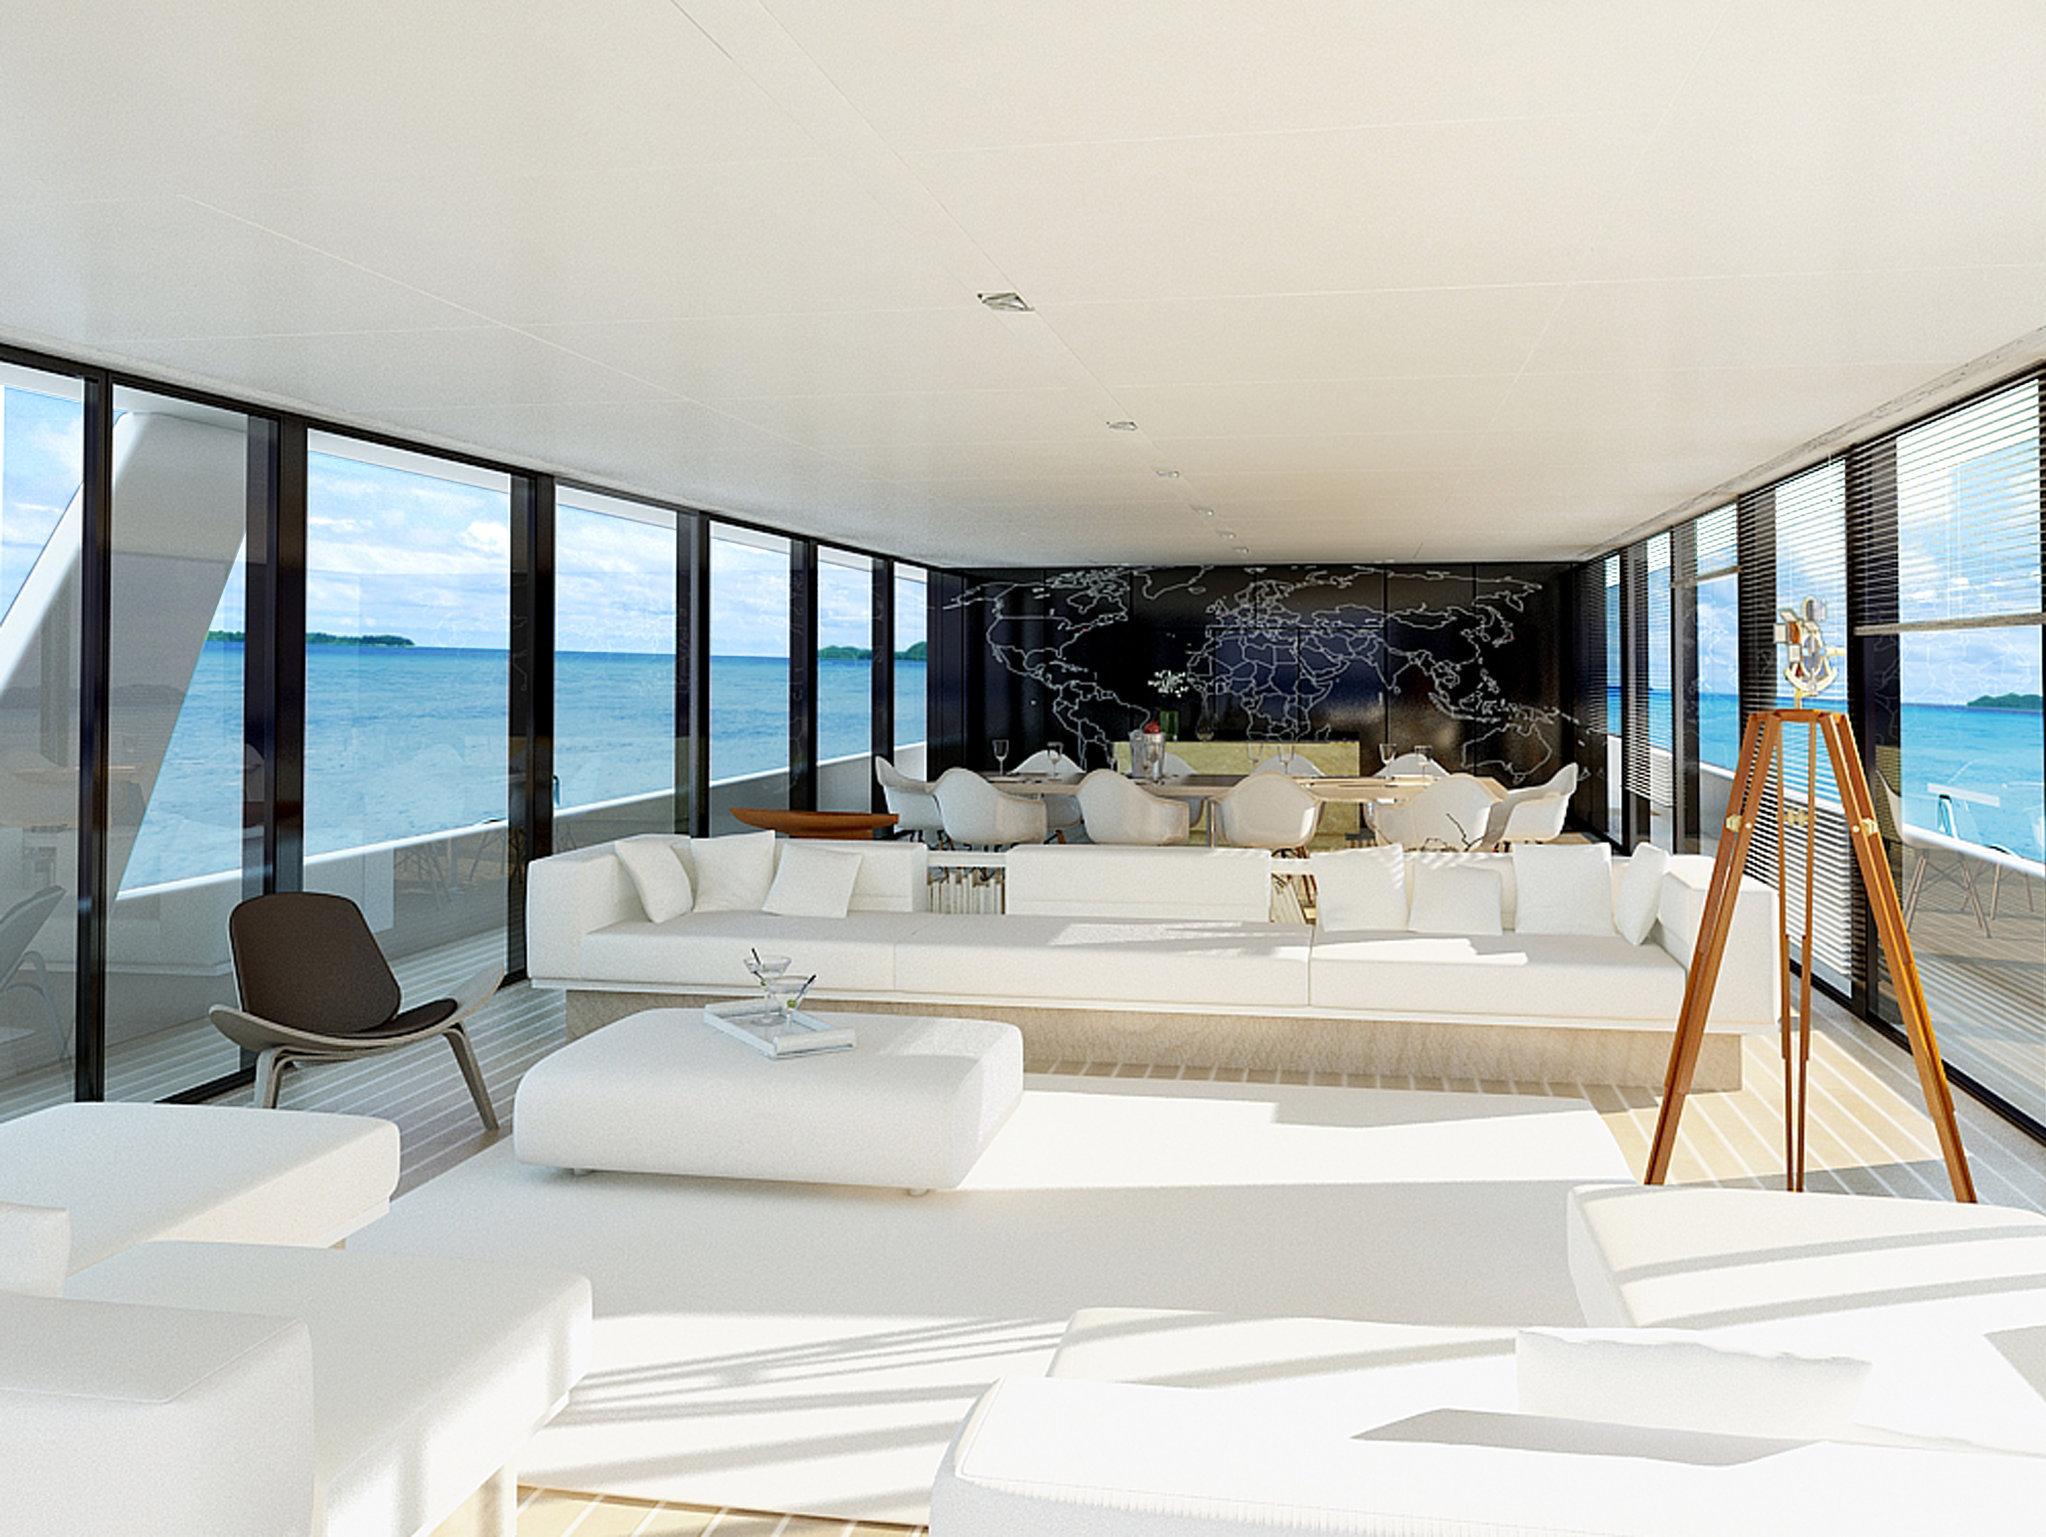 Yacht3.jpg